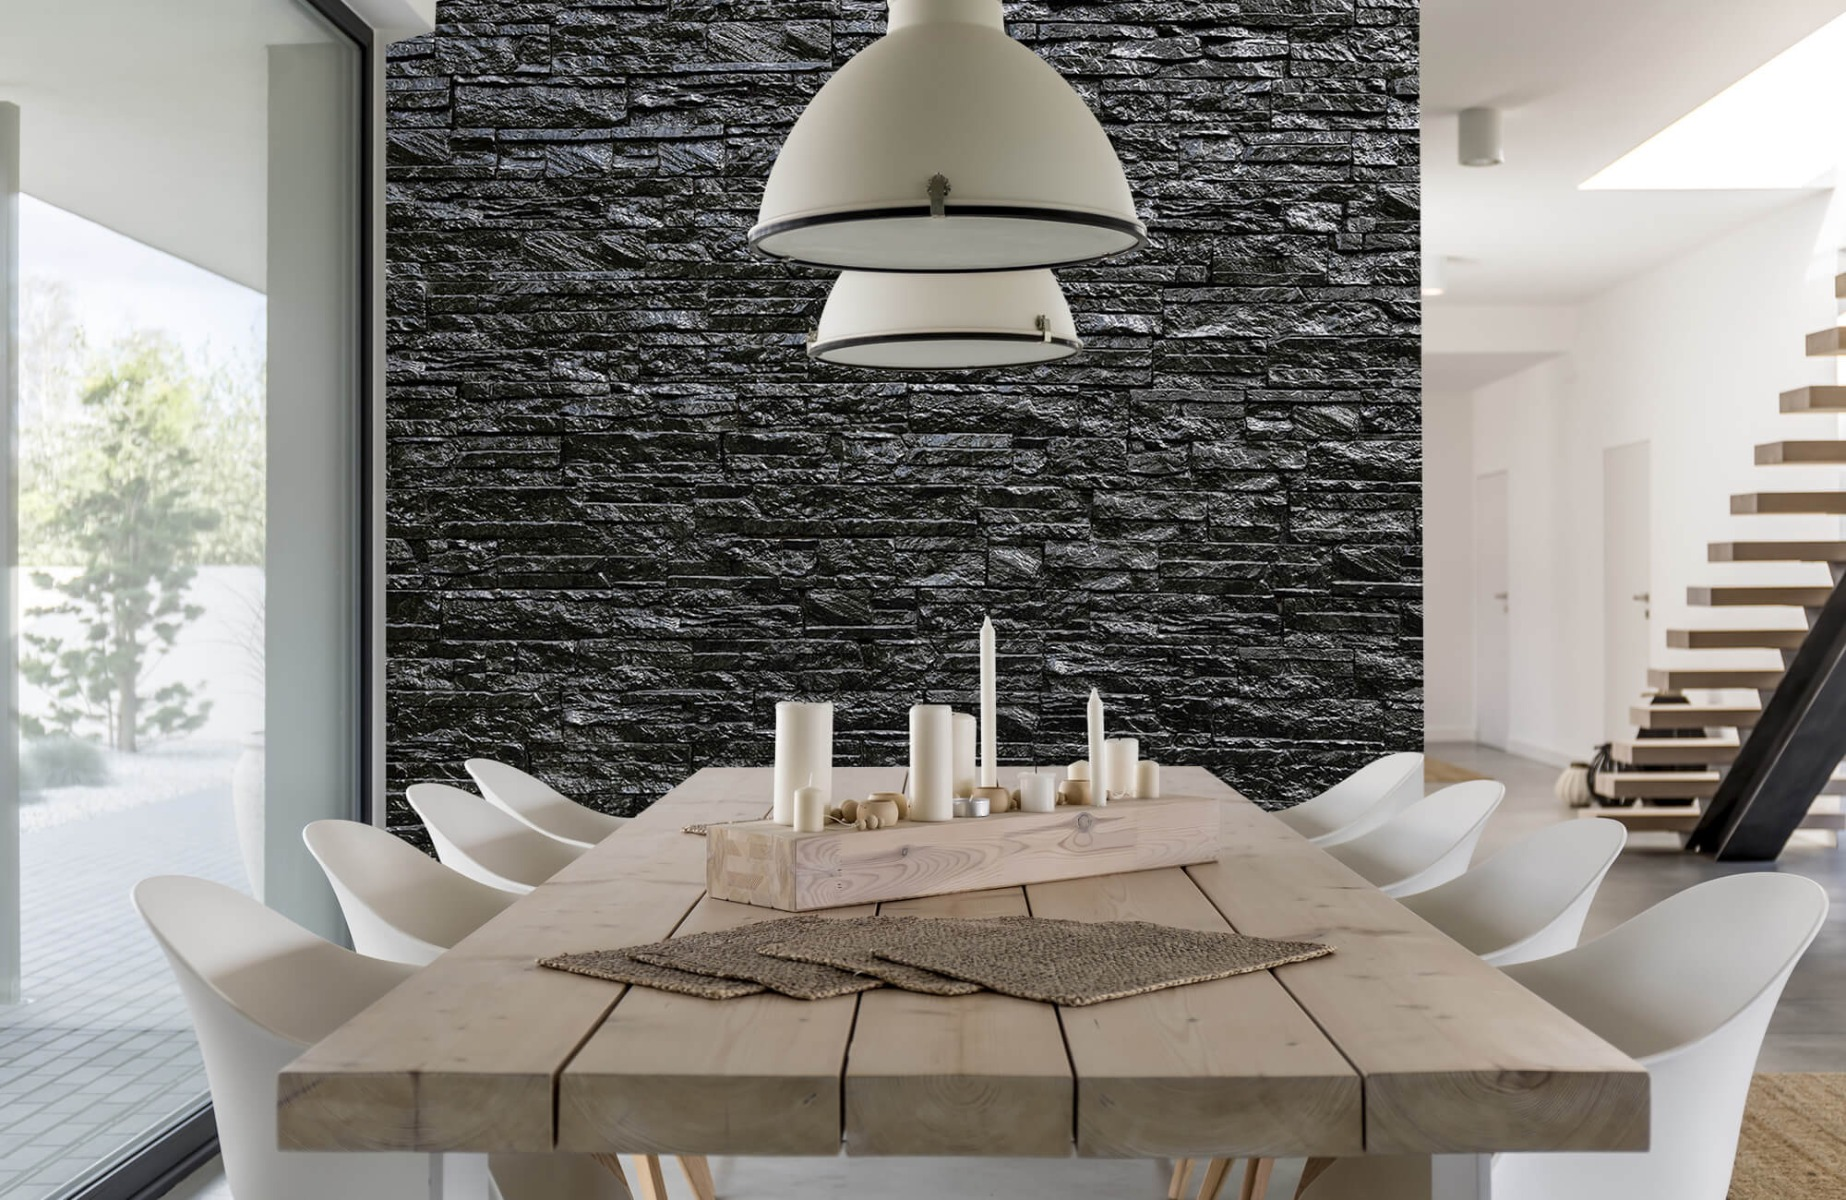 Steen behang - Zwarte stenen - Slaapkamer 2